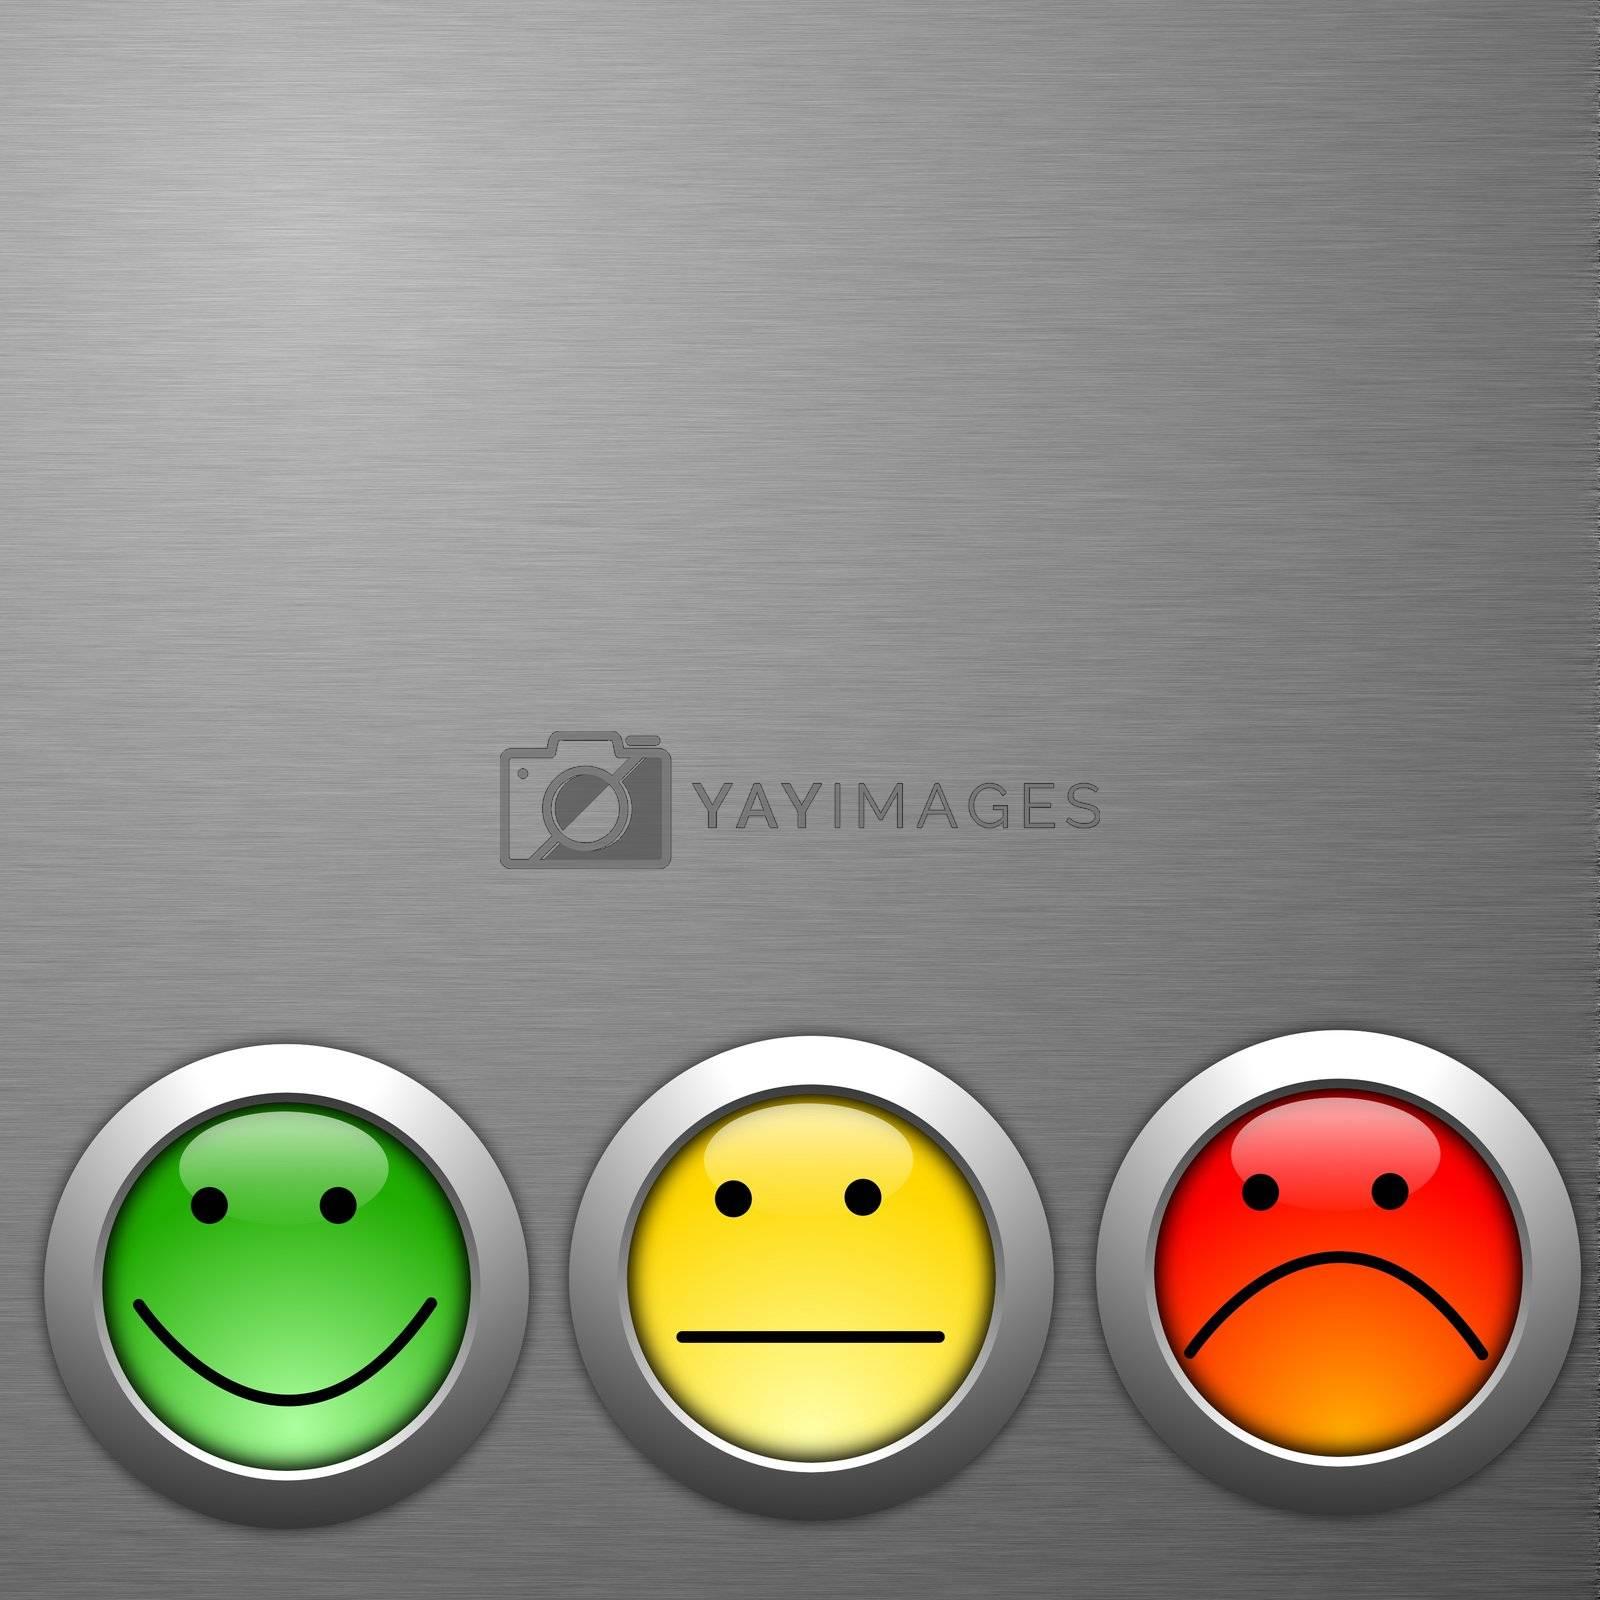 customer satisfaction survey by gunnar3000